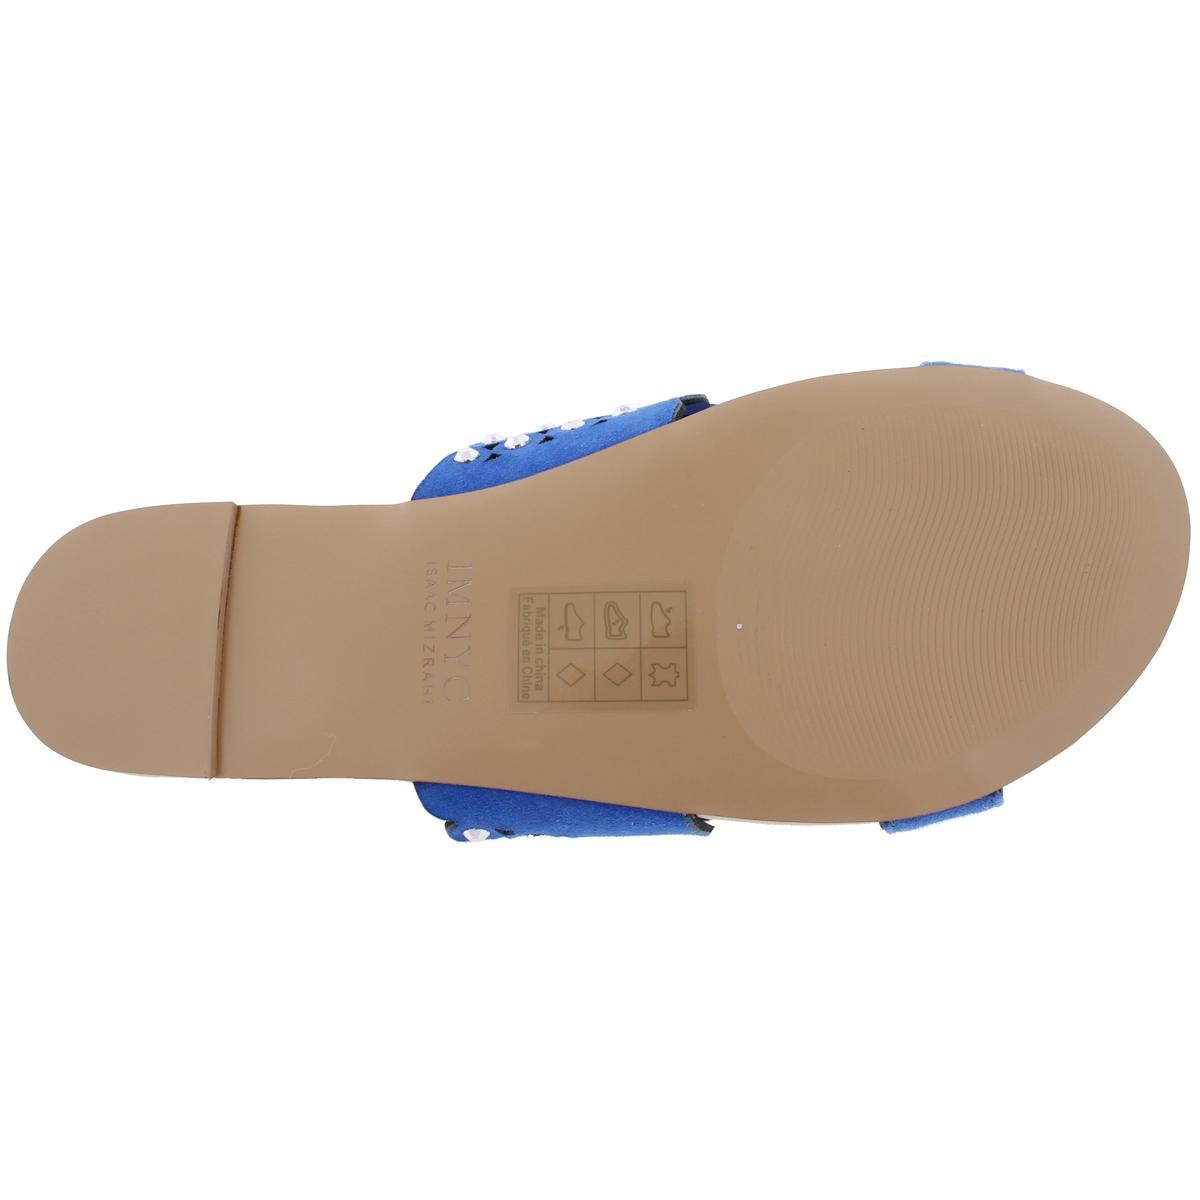 IMNYC-Isaac-Mizrahi-Womens-Suzie-Open-Toe-Studded-Slide-Sandals-Shoes-BHFO-2715 thumbnail 8